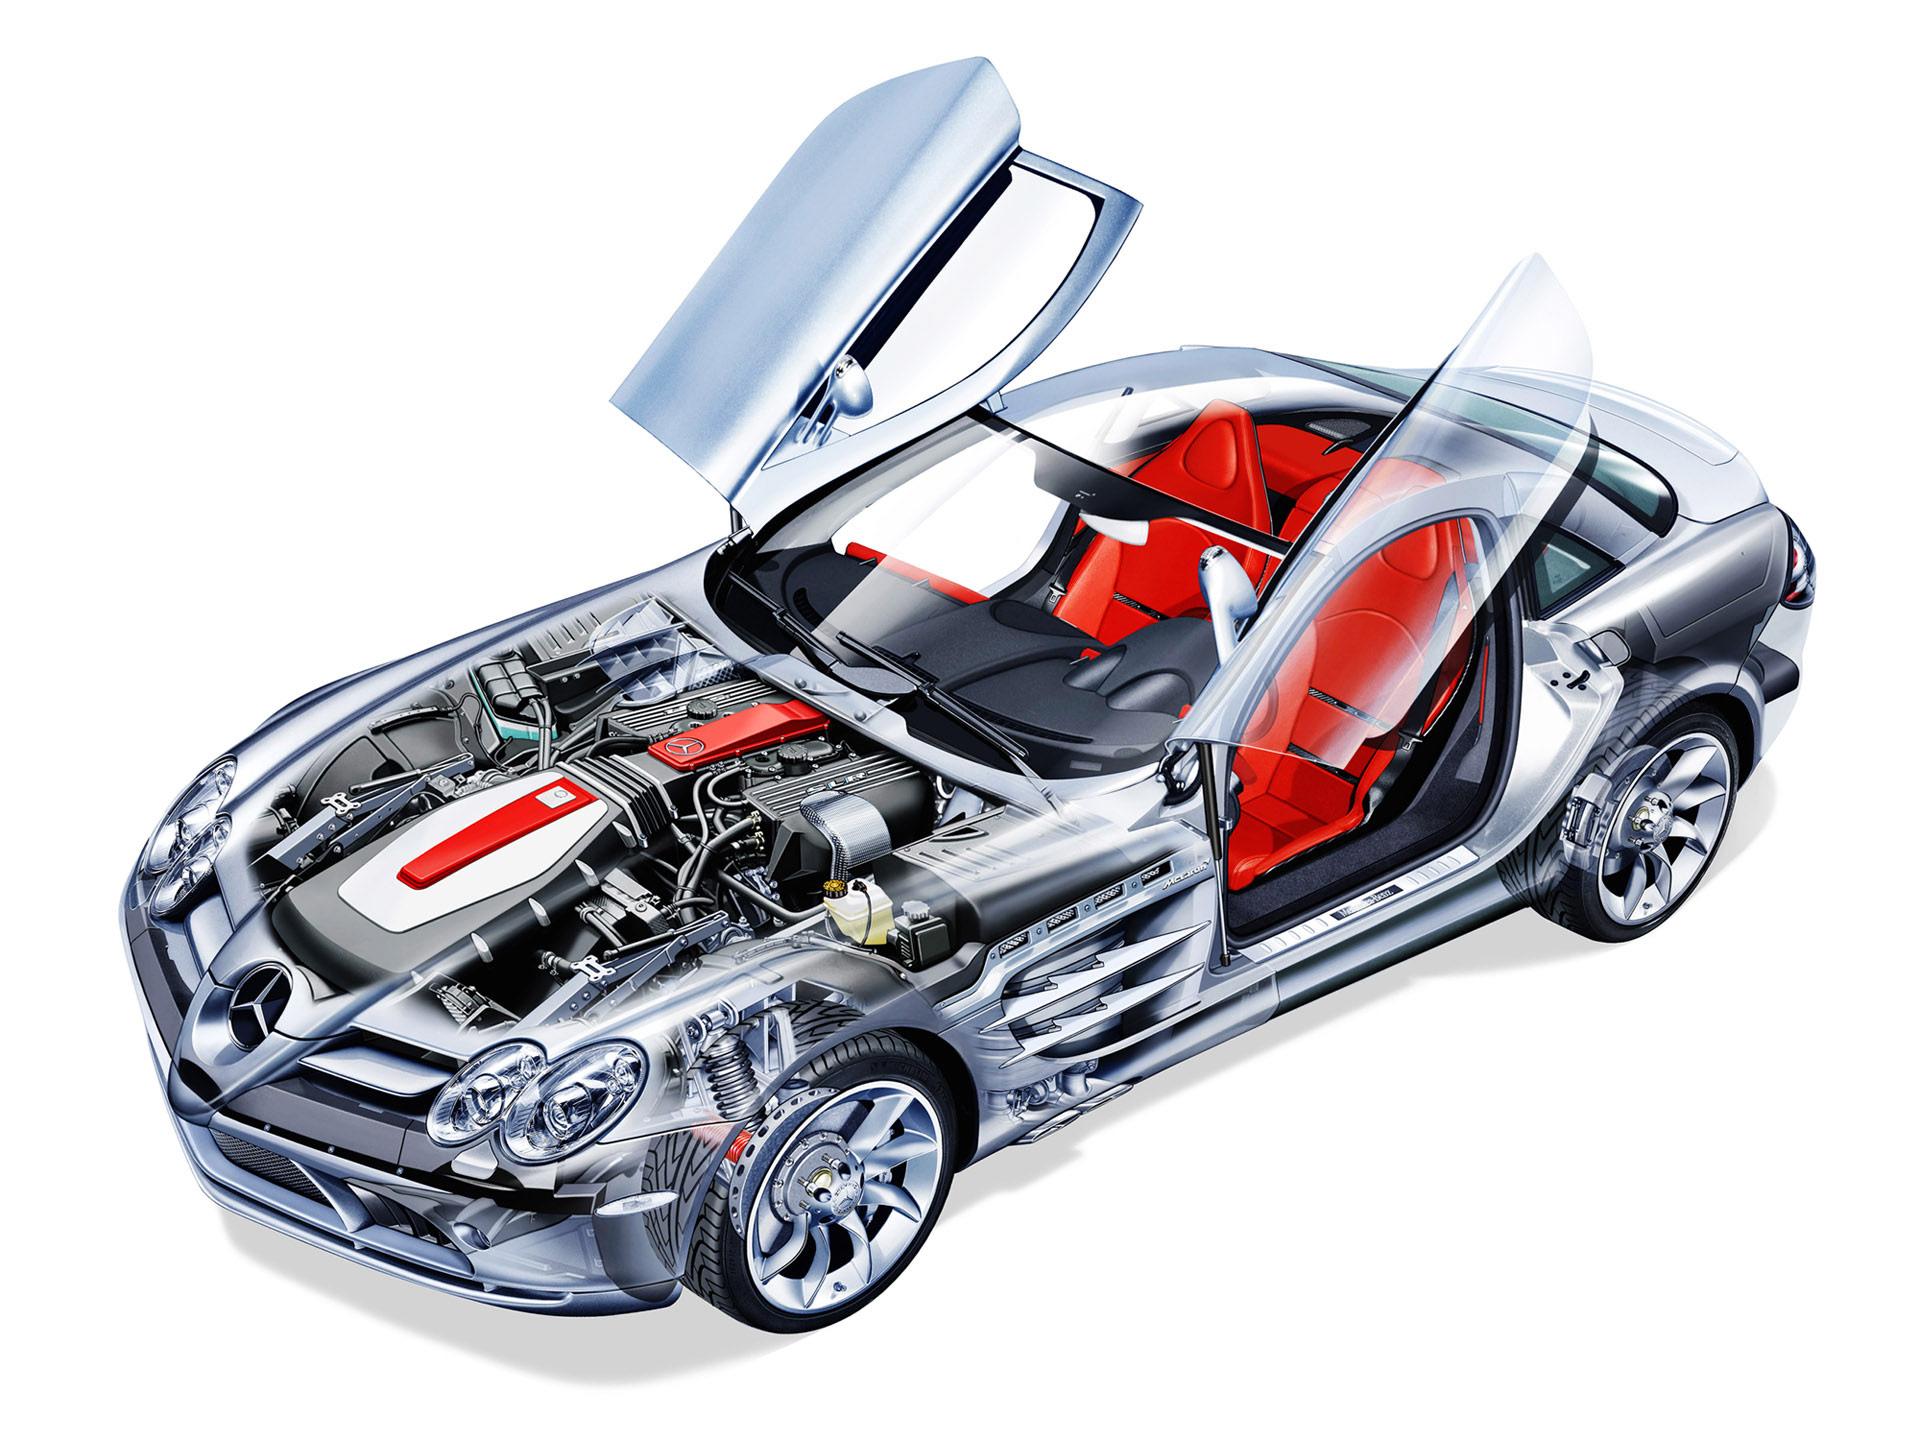 Mercedes-Benz SLR McLaren cutaway